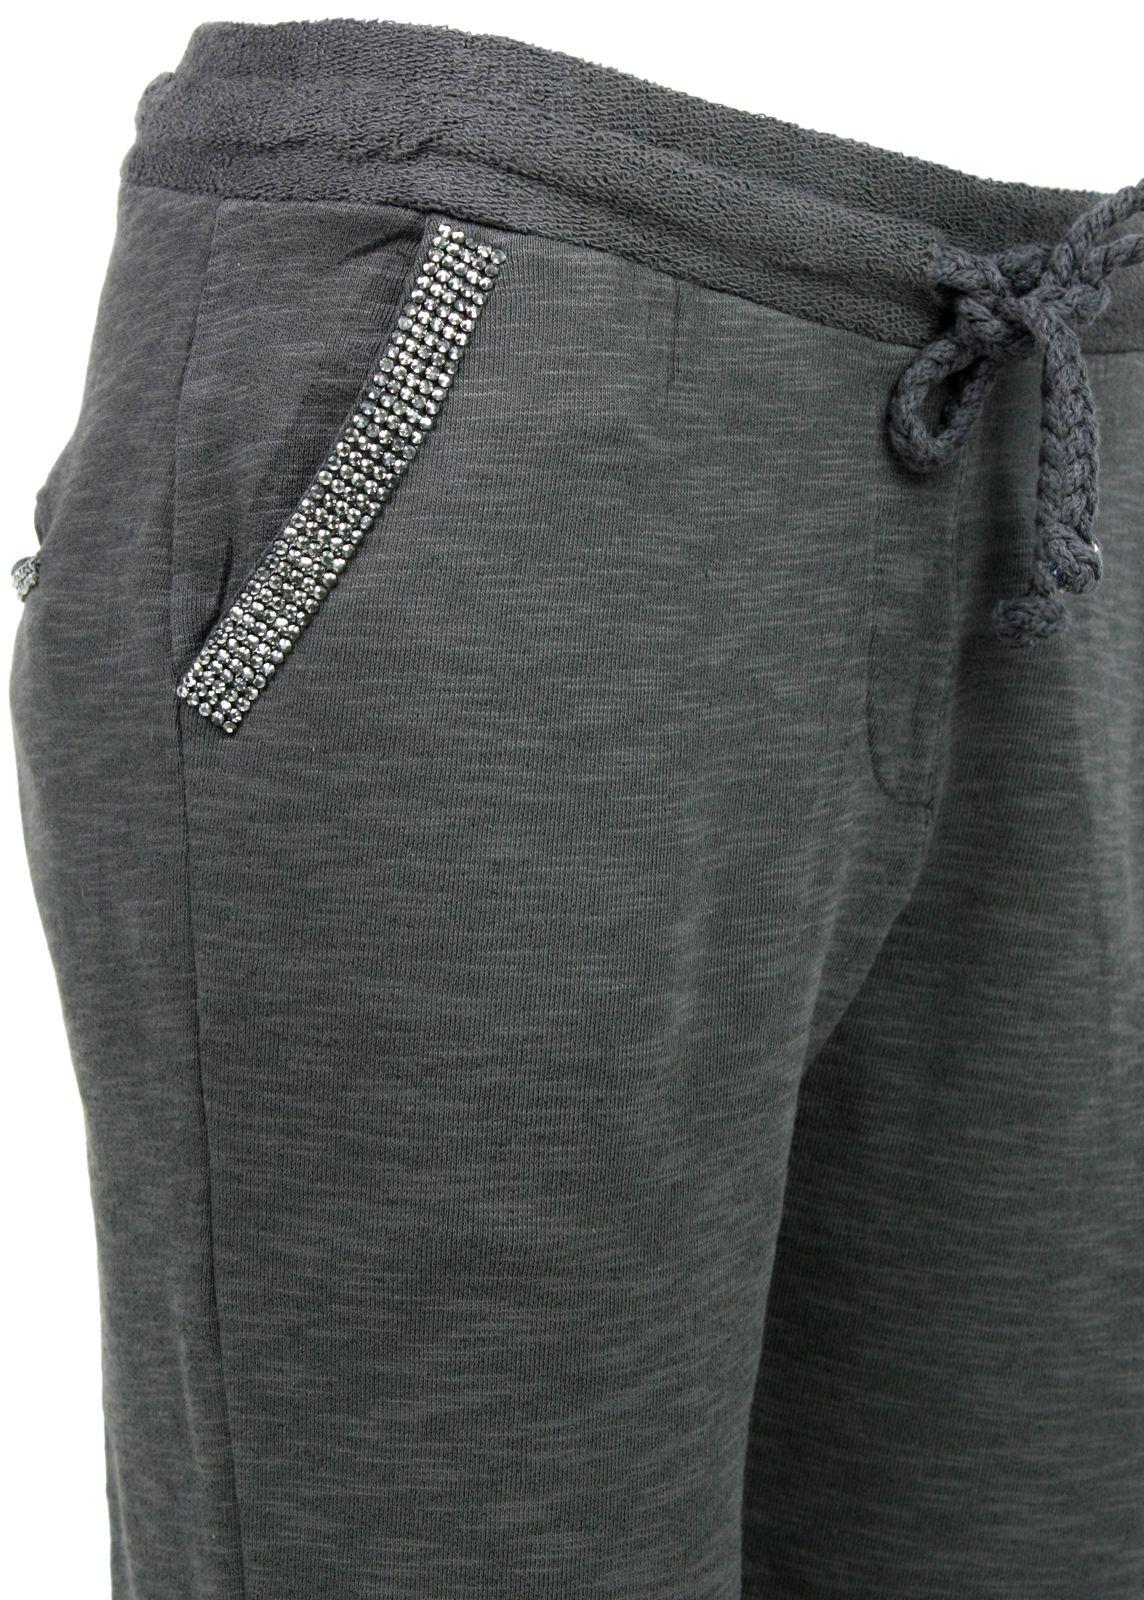 rich royal sweat pants phantom fettebeute online shop. Black Bedroom Furniture Sets. Home Design Ideas